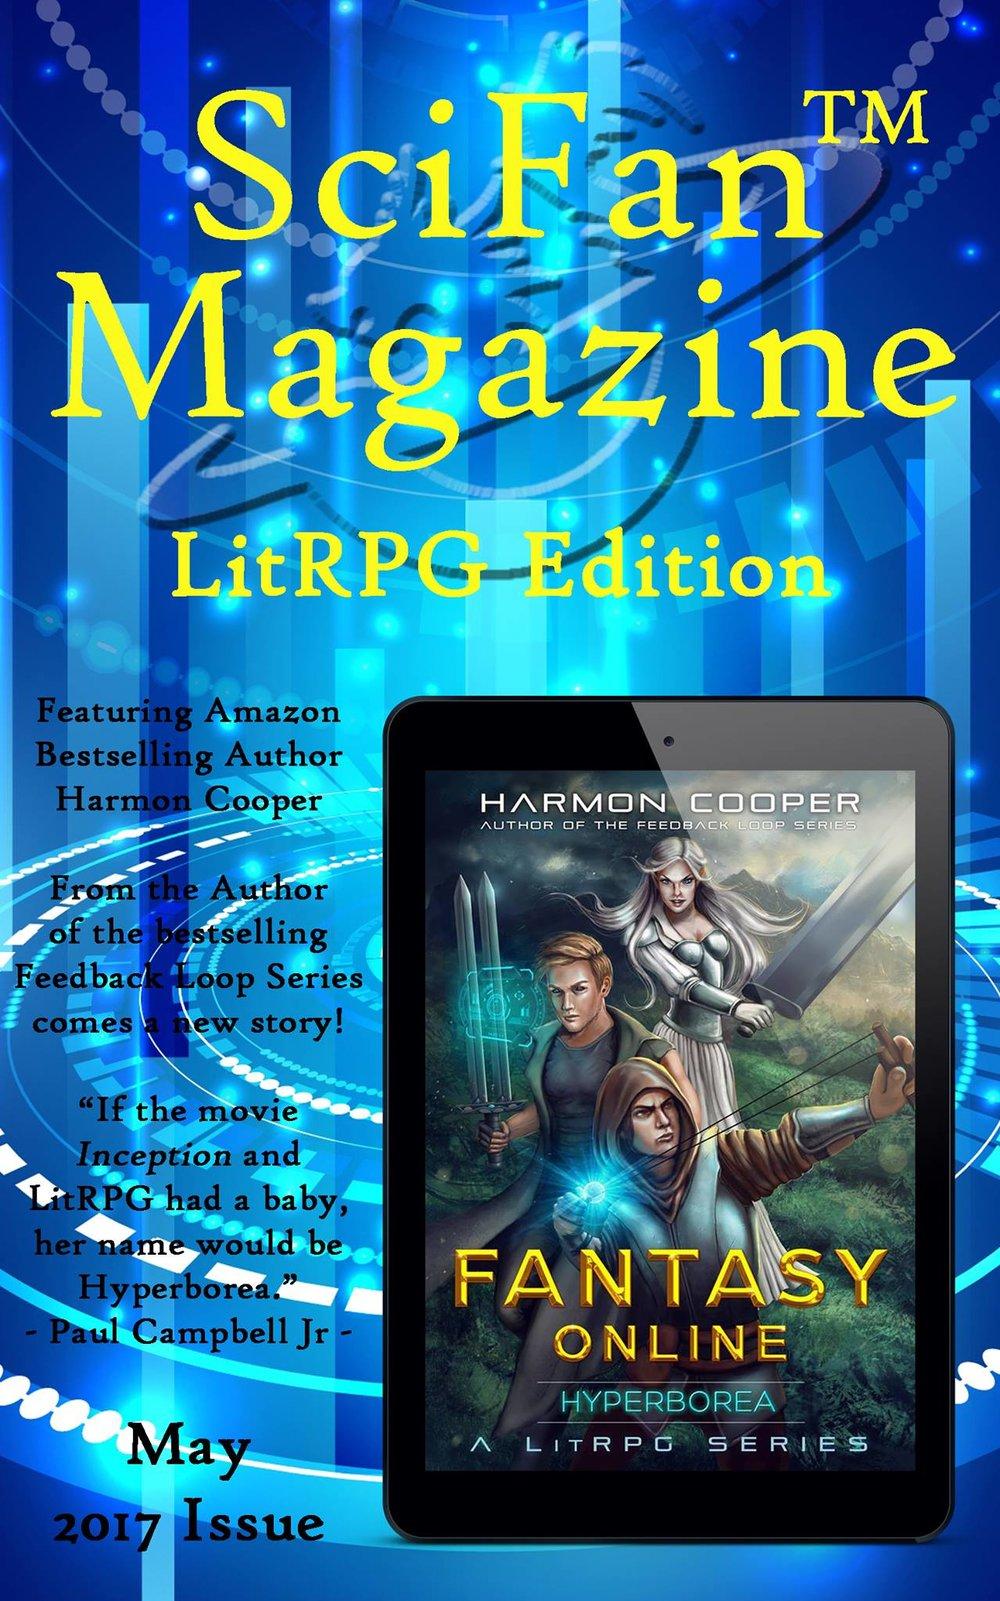 SciFan Magazine LitRPG Edition